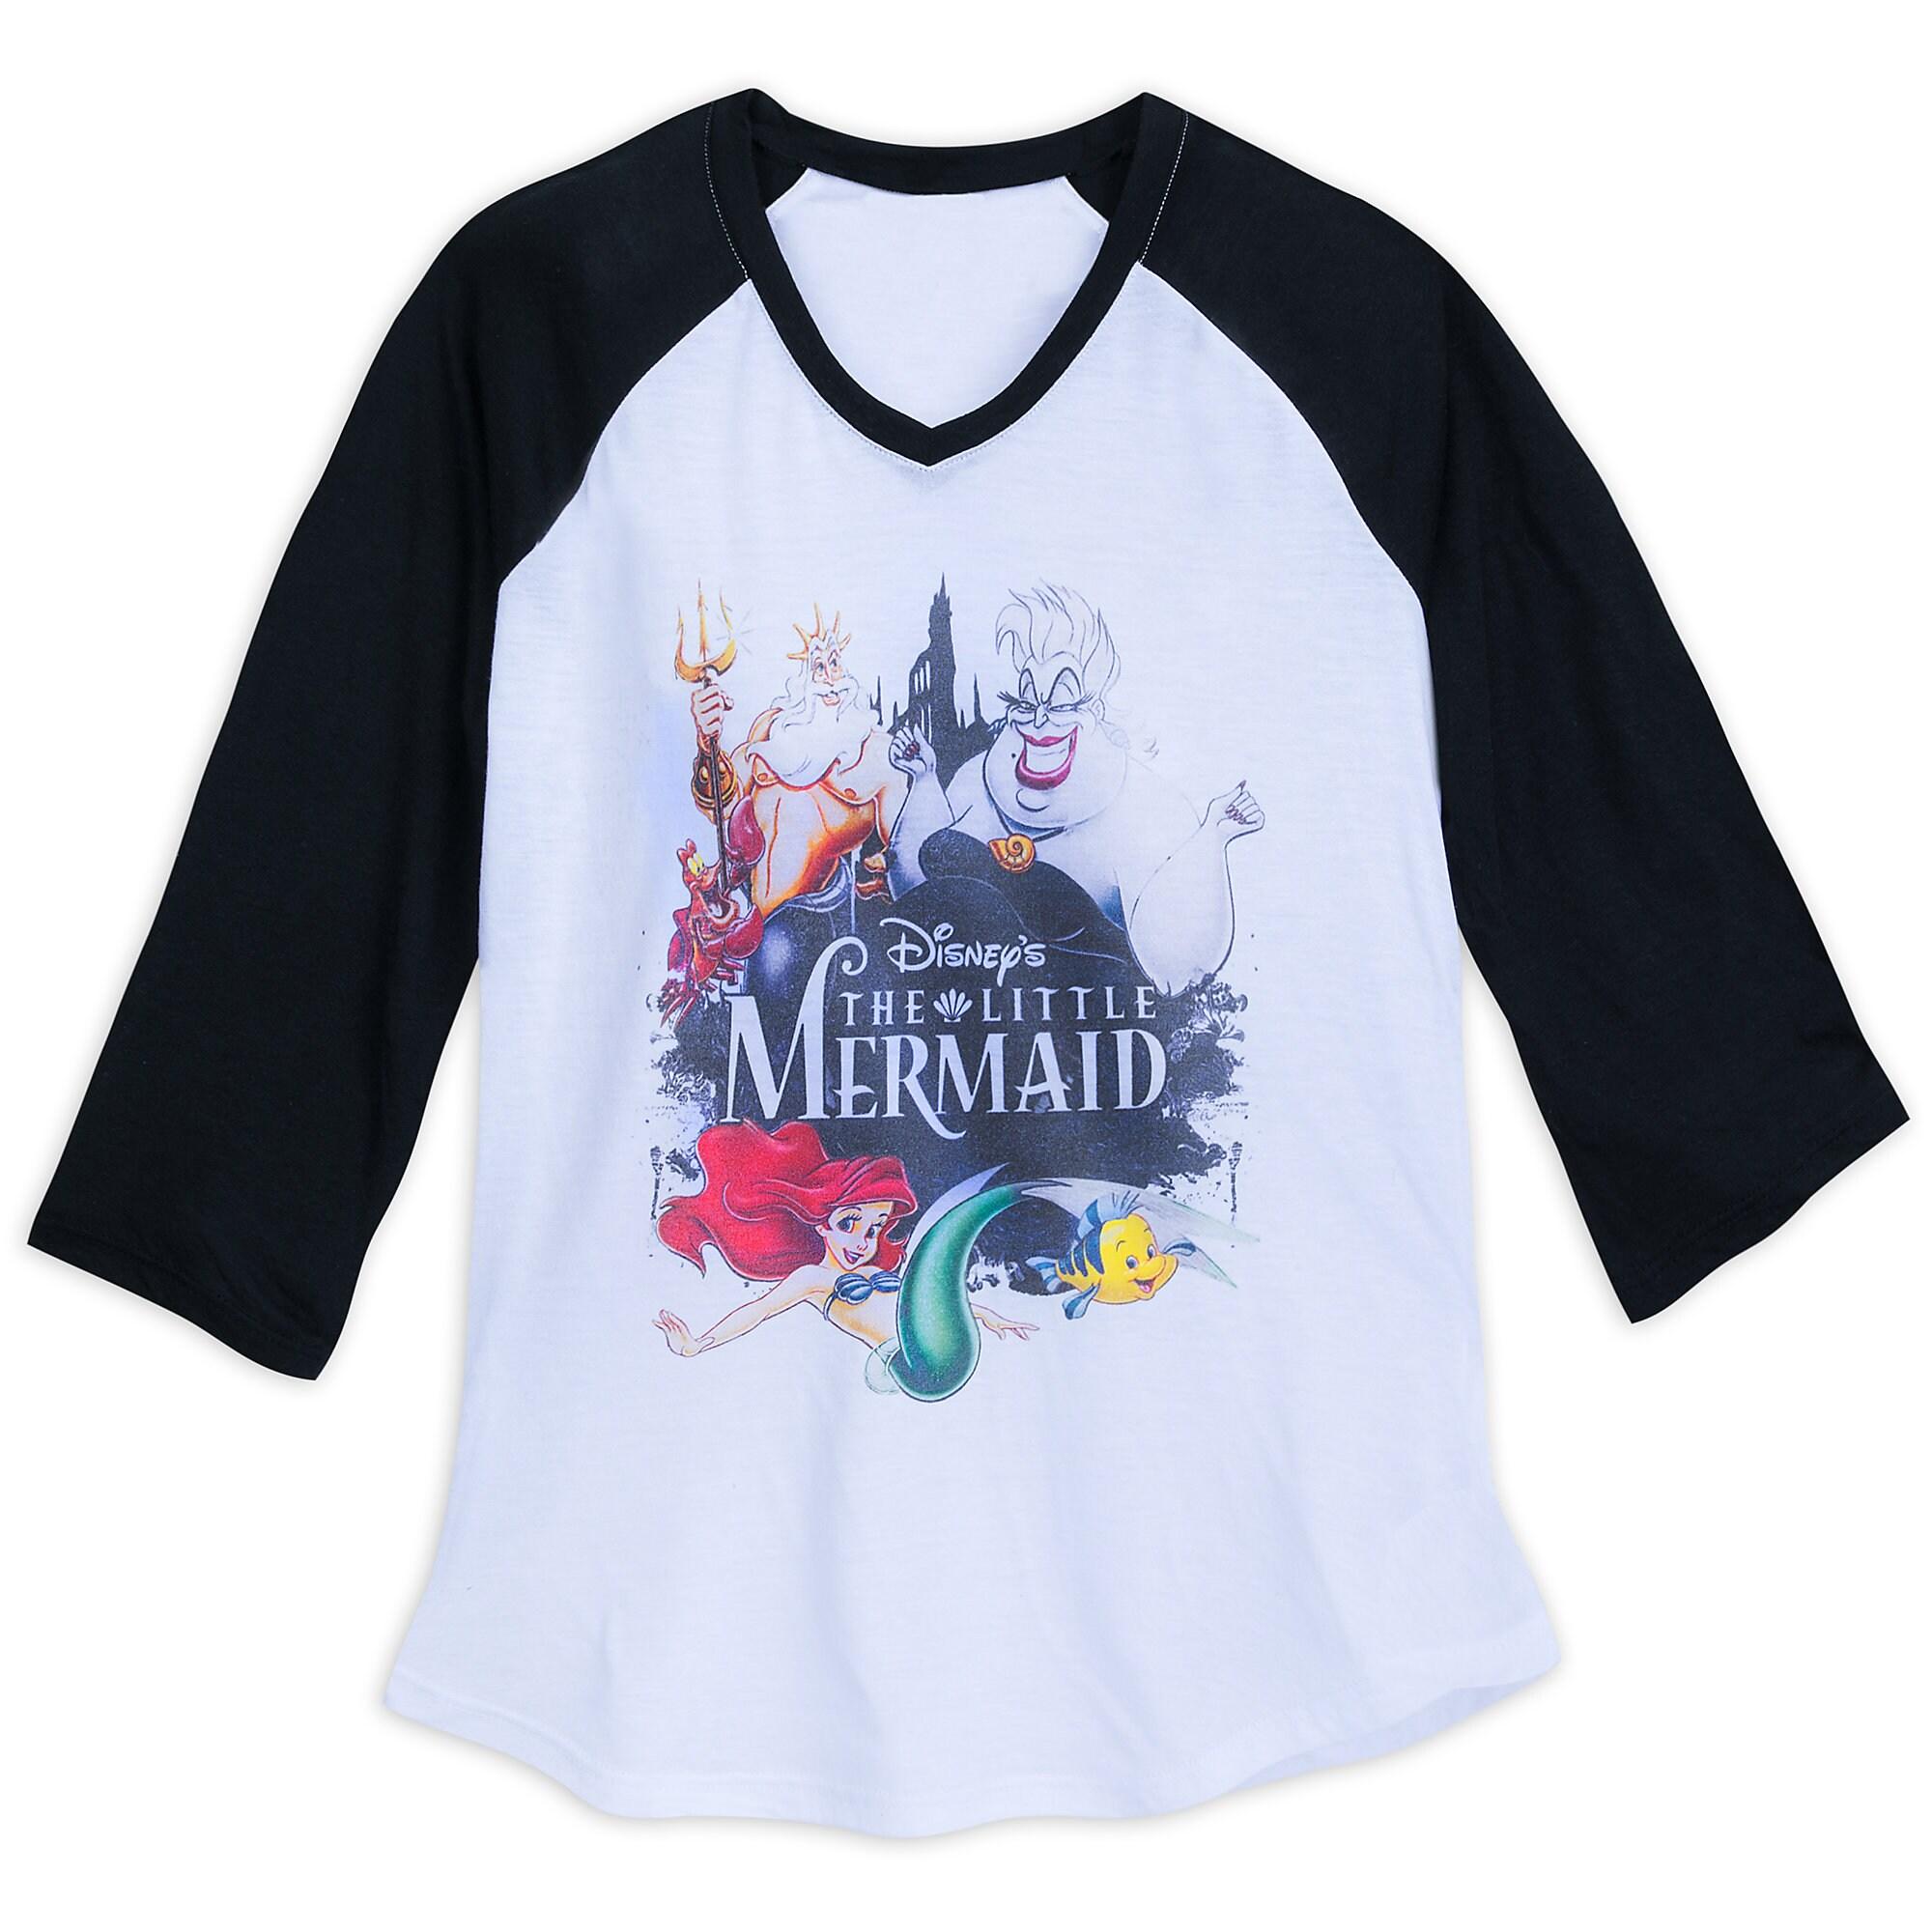 The Little Mermaid Raglan T-Shirt for Women